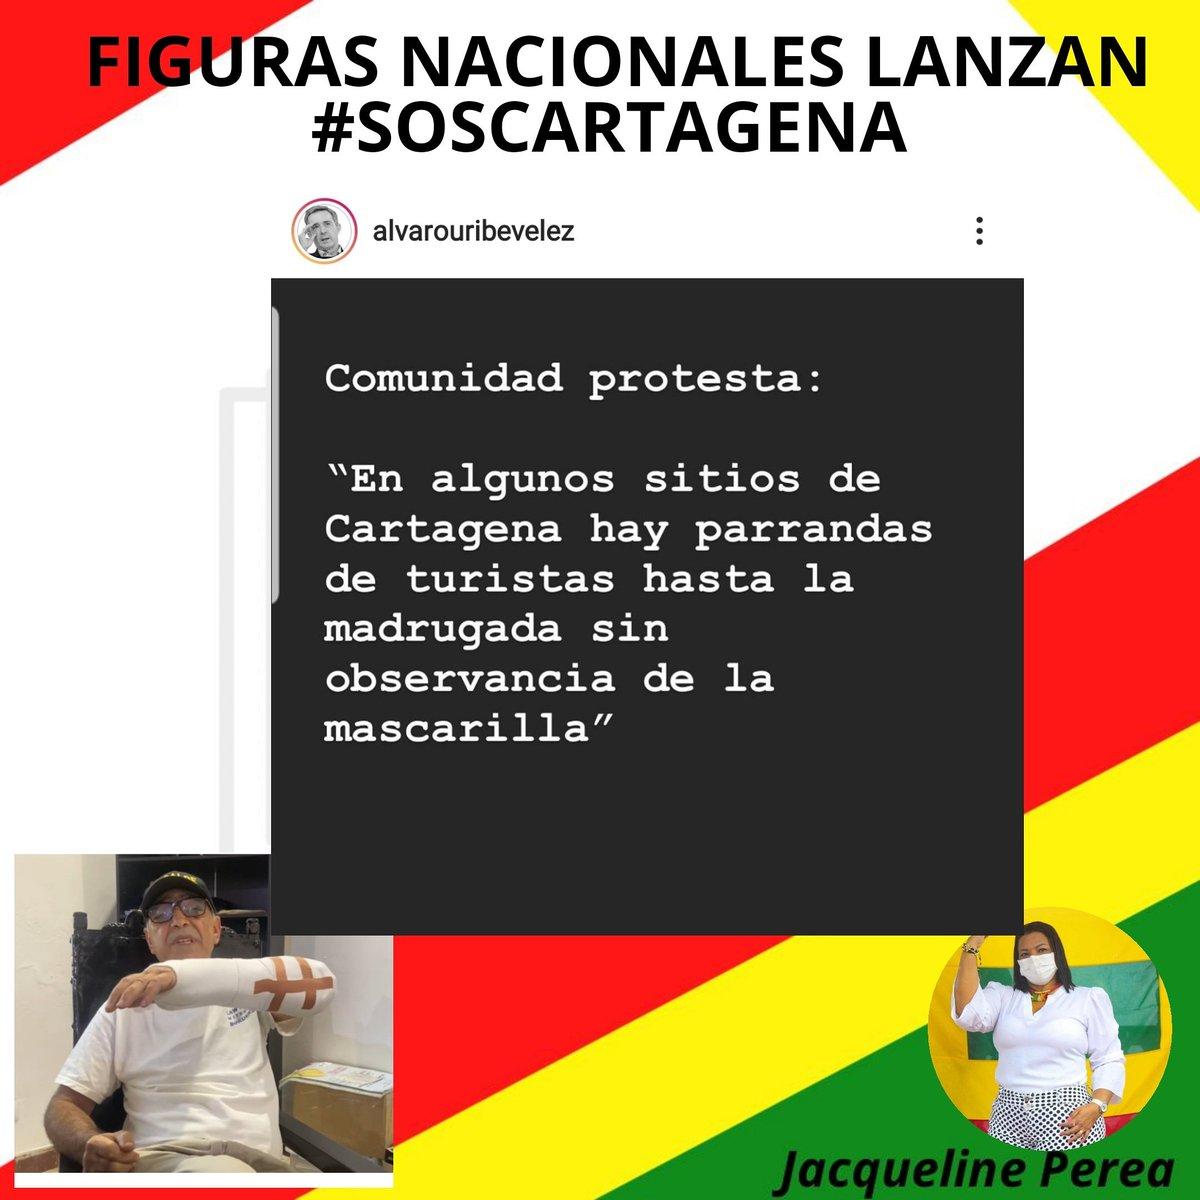 @AlvaroUribeVel @IvanDuque @daulaw @AlcaldiaCTG  Caos en Cartagena!! #SOSCARTAGENA #RevocatoriaYa